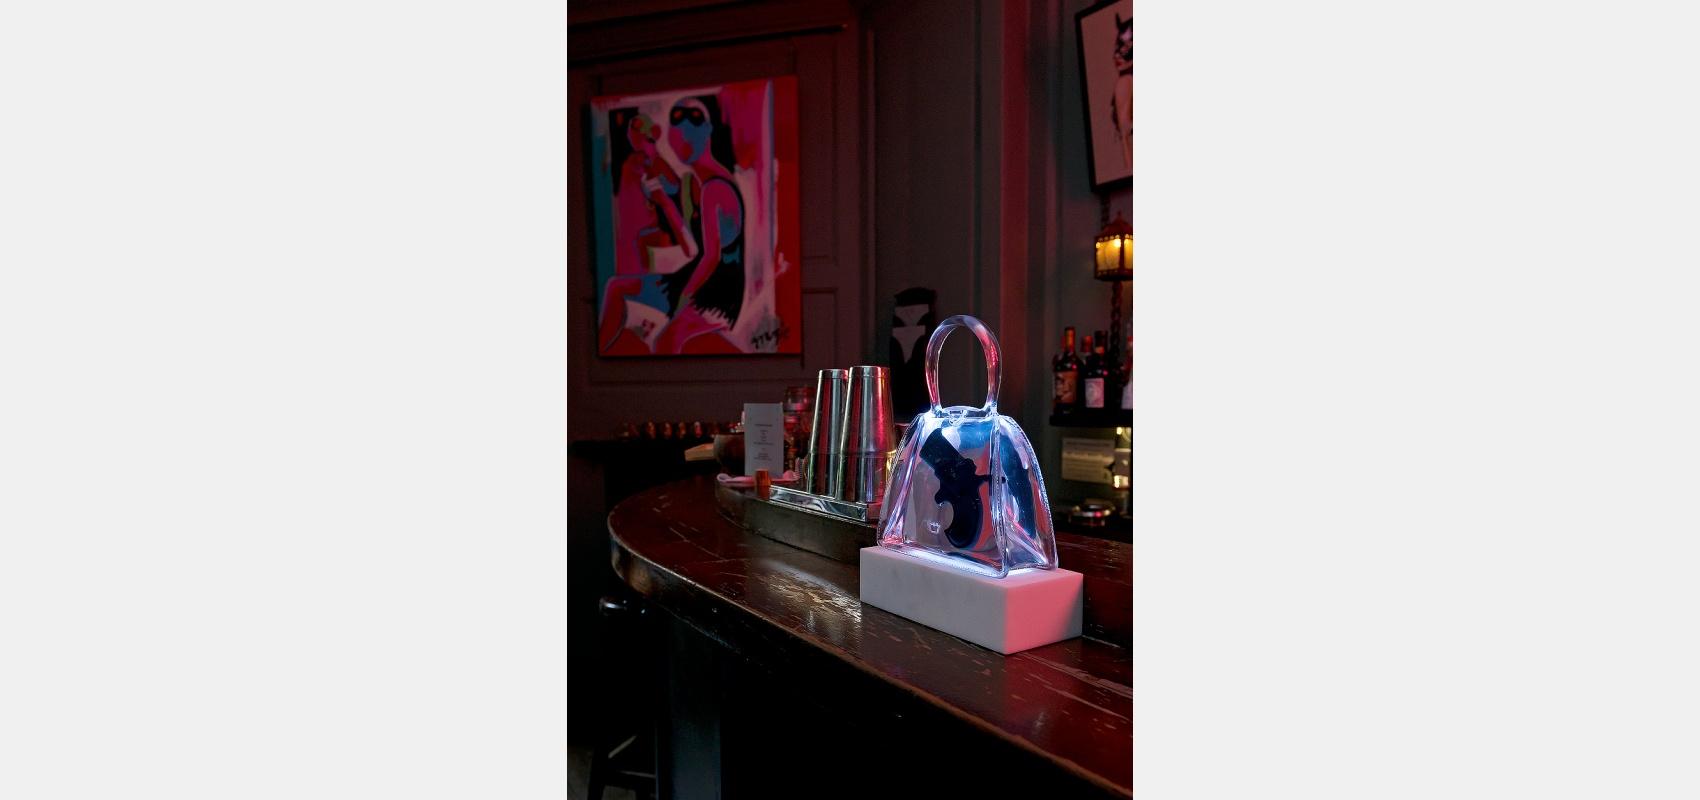 Location photography/Hidden Soho/club interior/ handbag & gun /artwork/ bar.